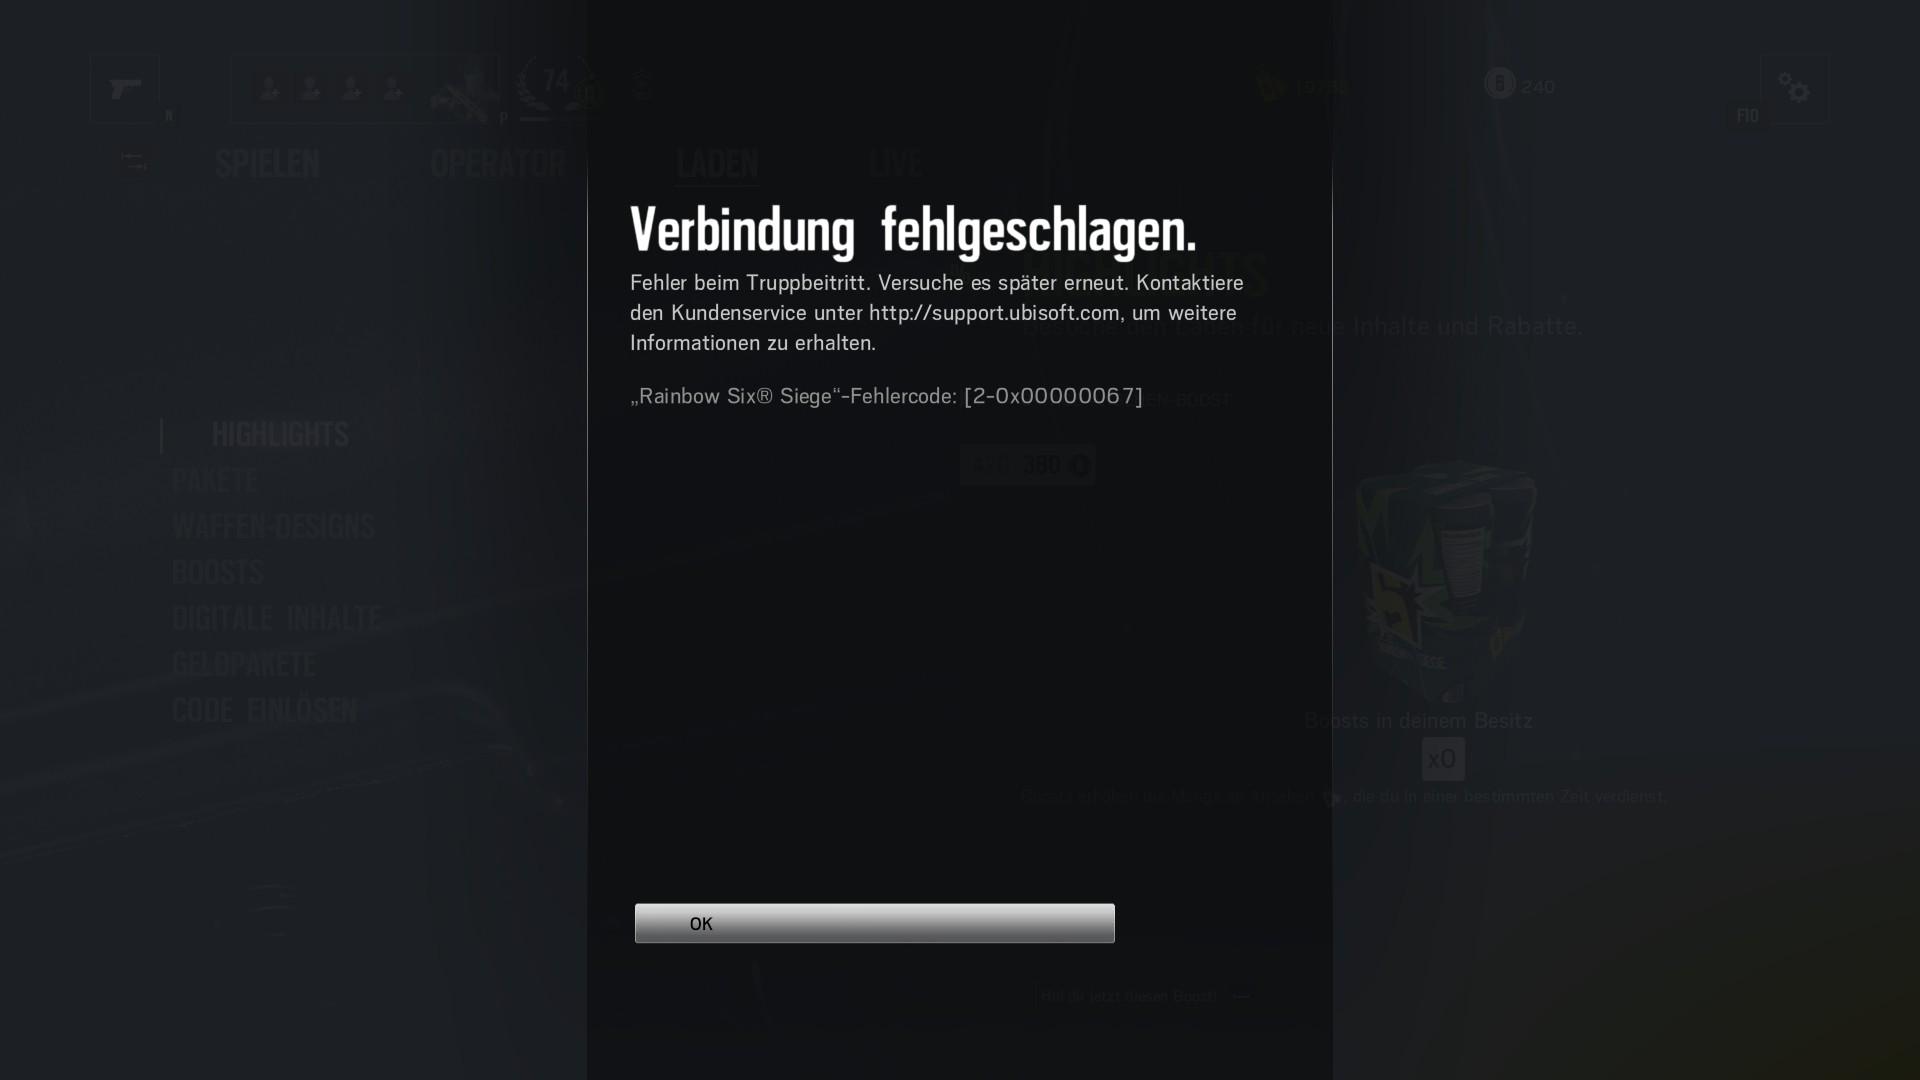 Teamviewer verbindung zum router fehlgeschlagen